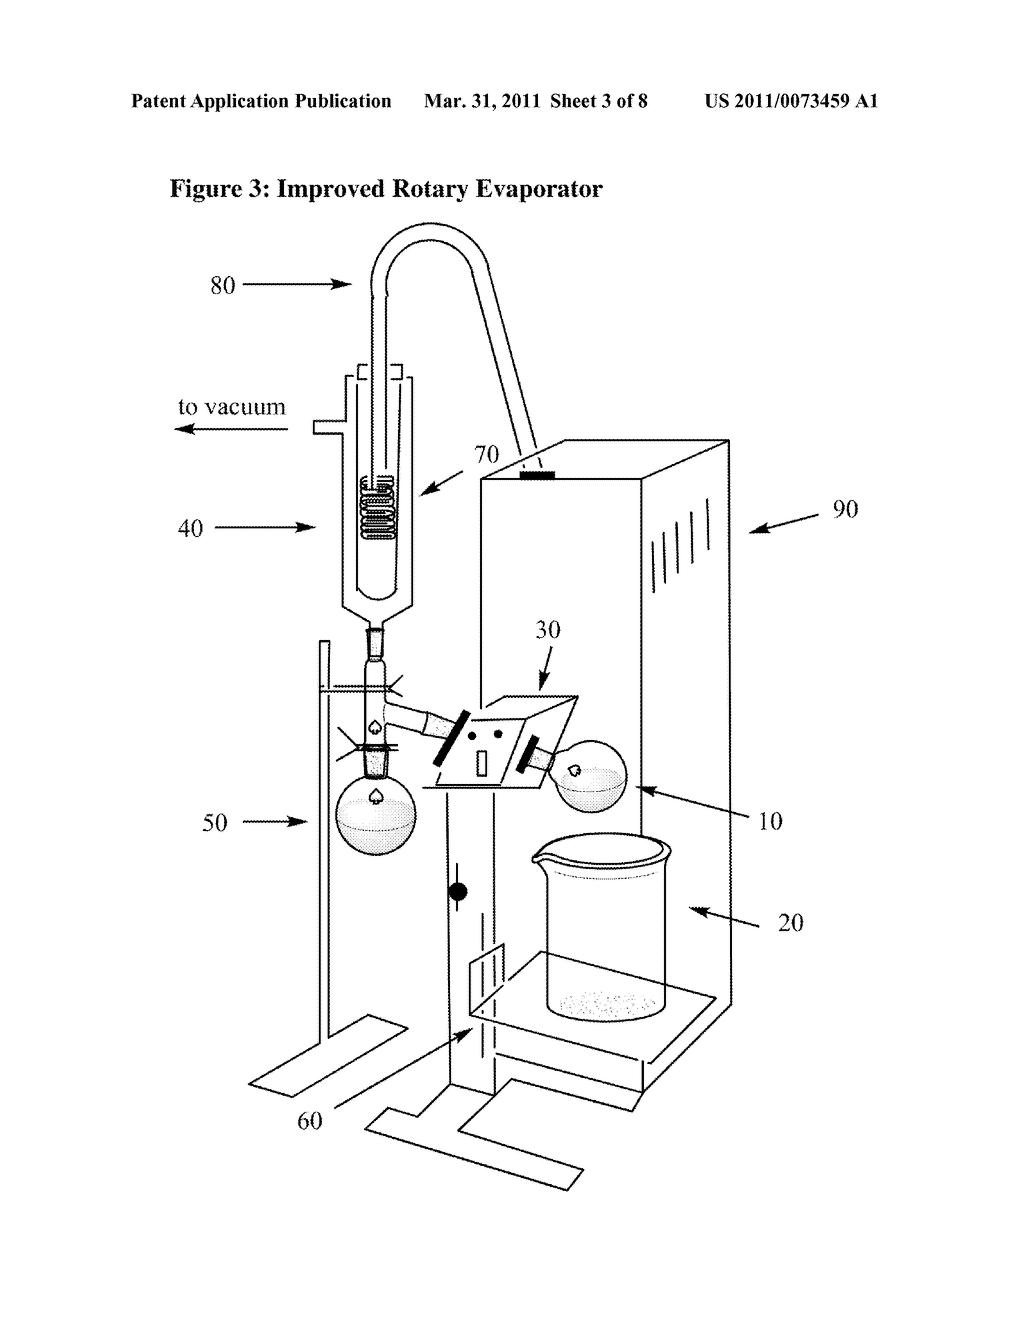 rotary evaporator diagram schematic and image 04 rh patentsencyclopedia com rotary evaporator schematic evaporator wiring schematic